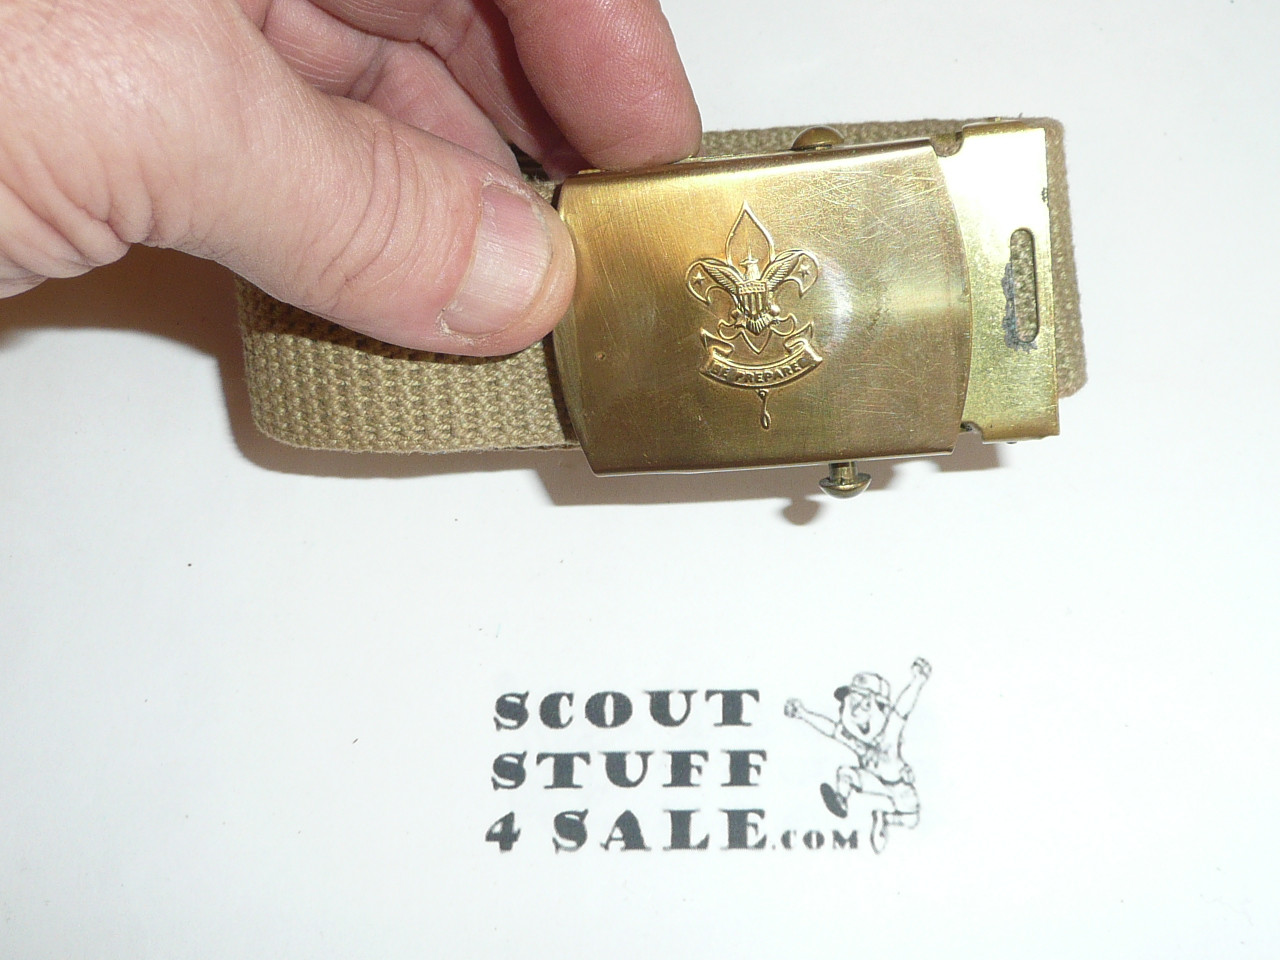 1960's Boy Scout Brass Friction Belt Buckle and webbed belt, unused